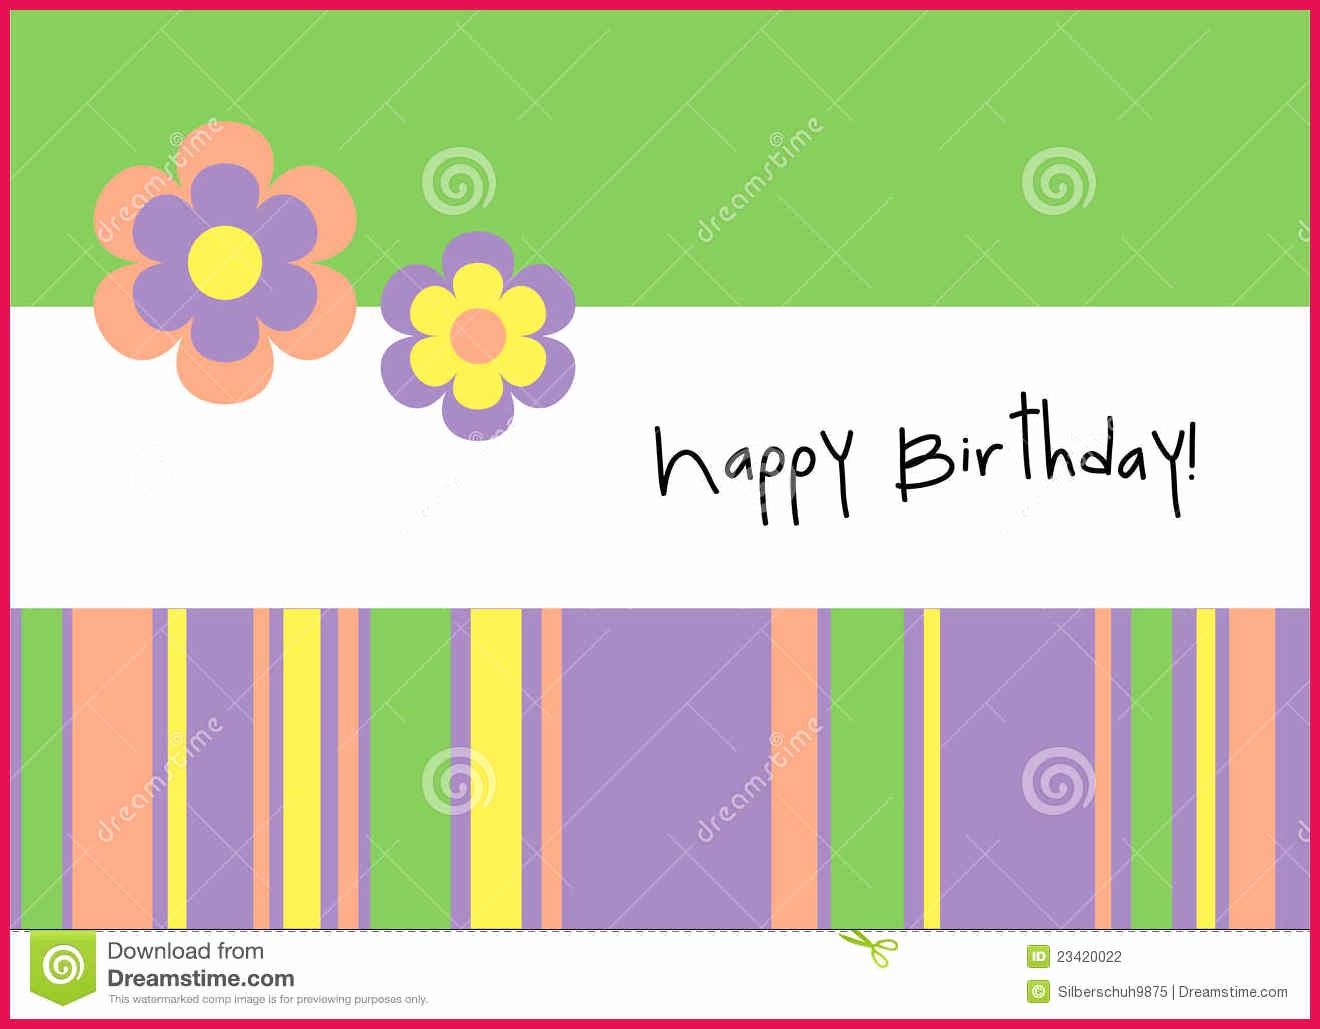 Happy Birthday Card Template Elegant Happy Birthday Card Template